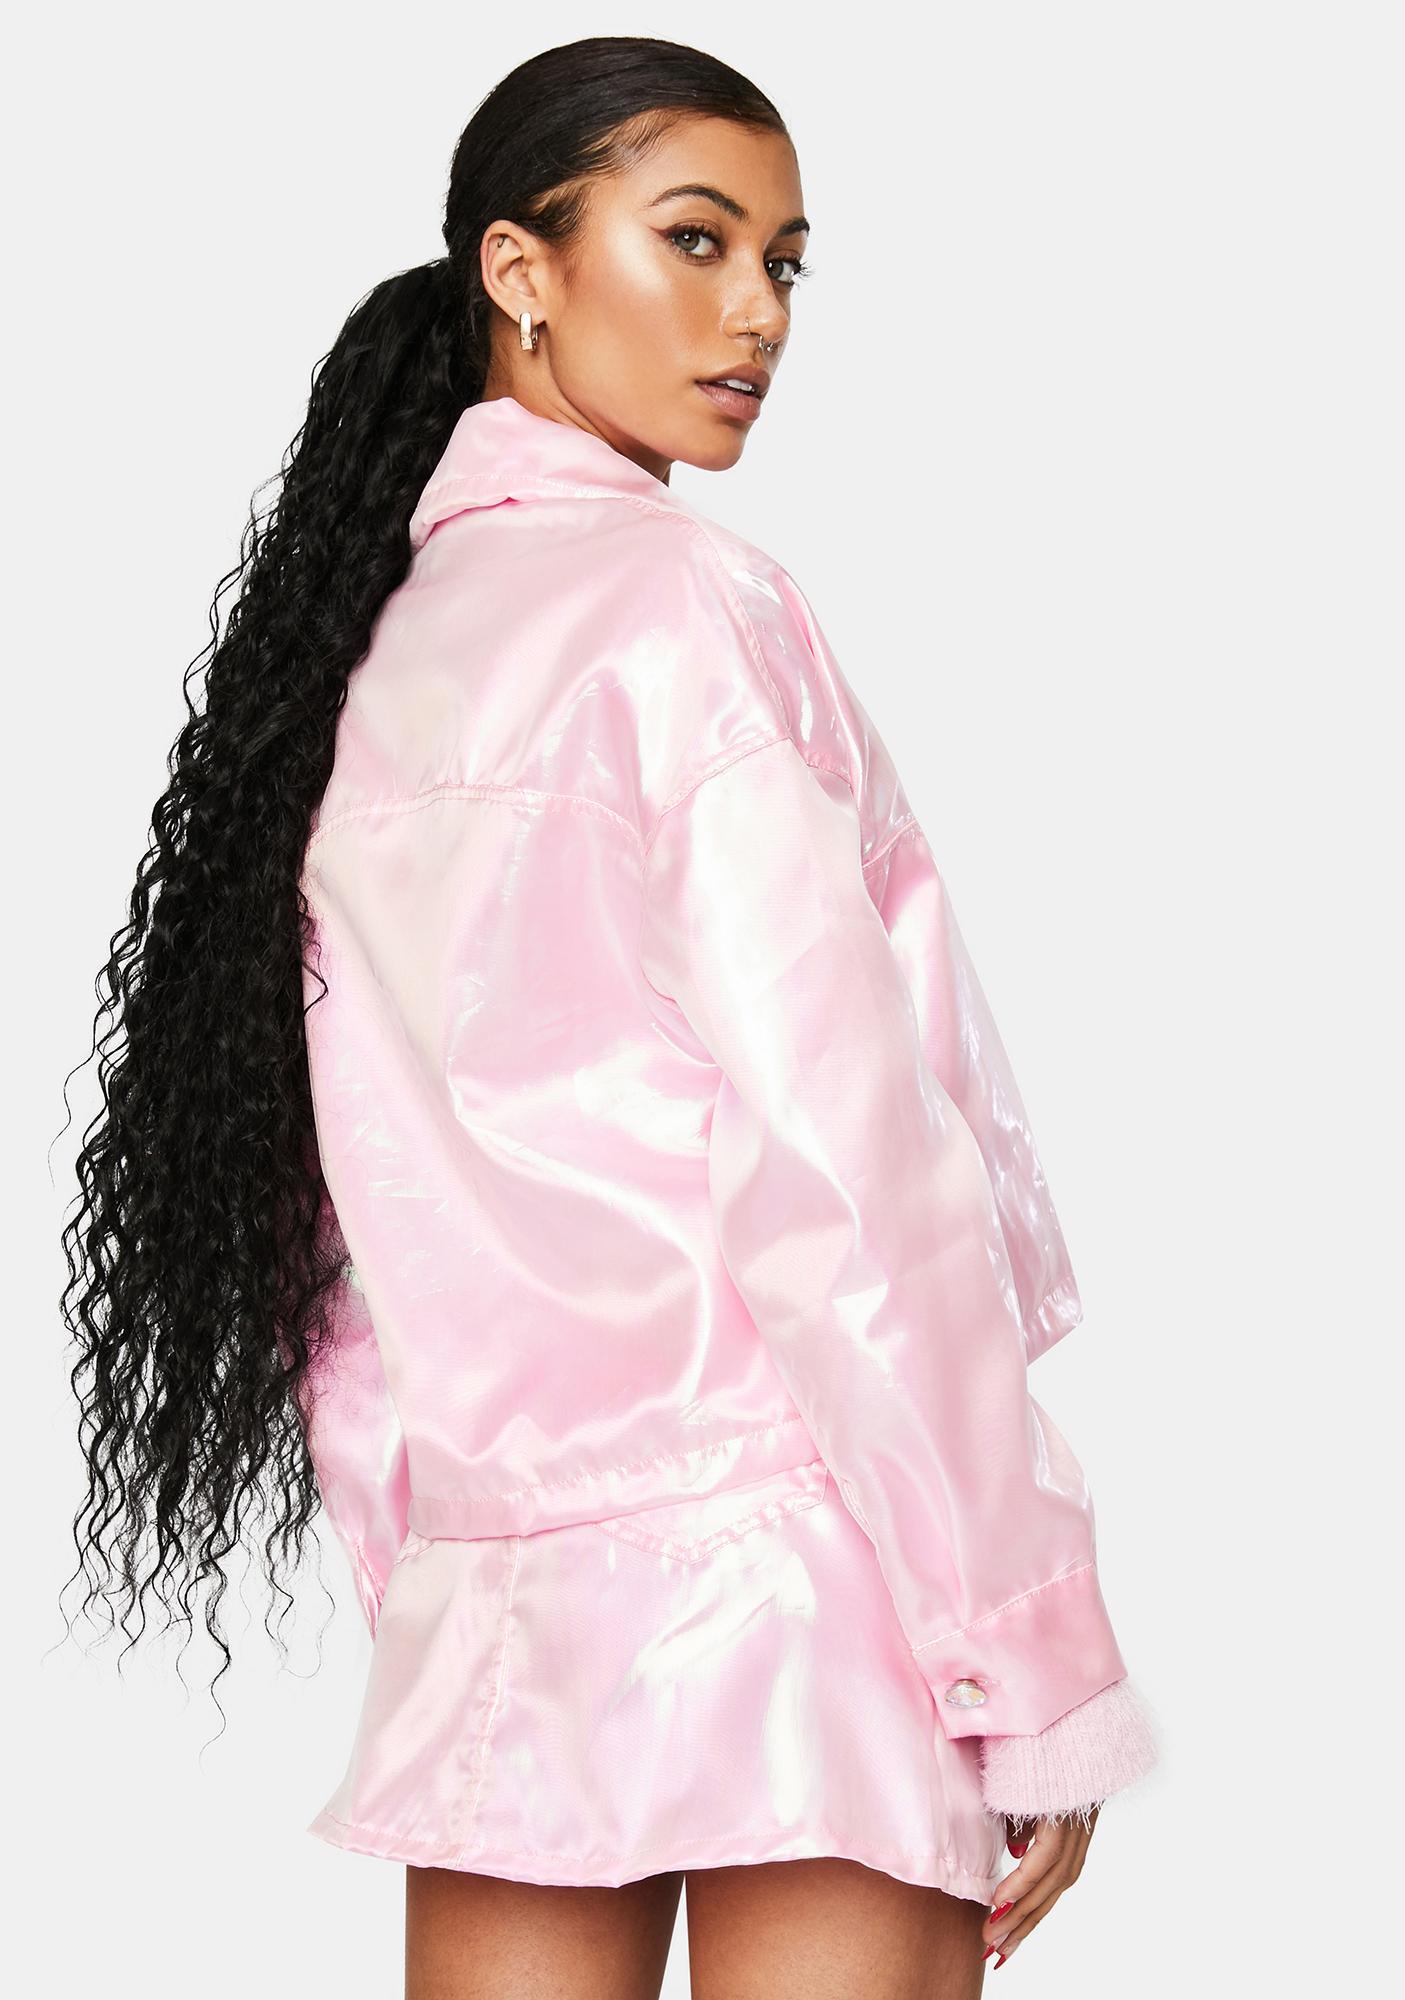 Sparkl Fairy Couture Light Pink Fairy Dust Iridescent Jacket